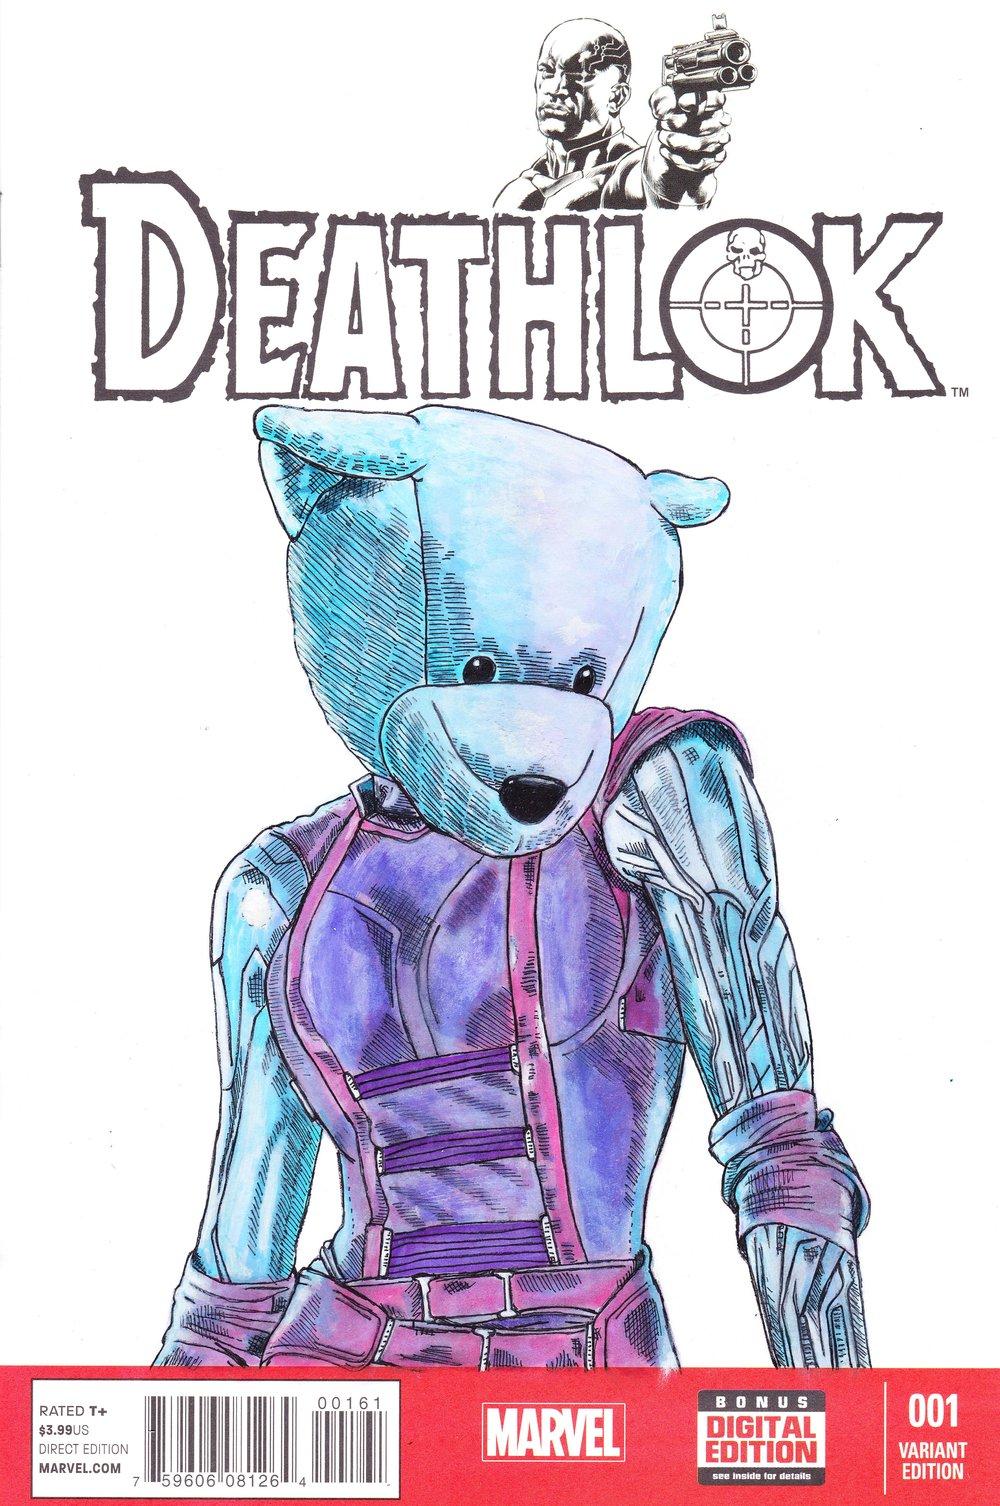 Deathlok. 2018